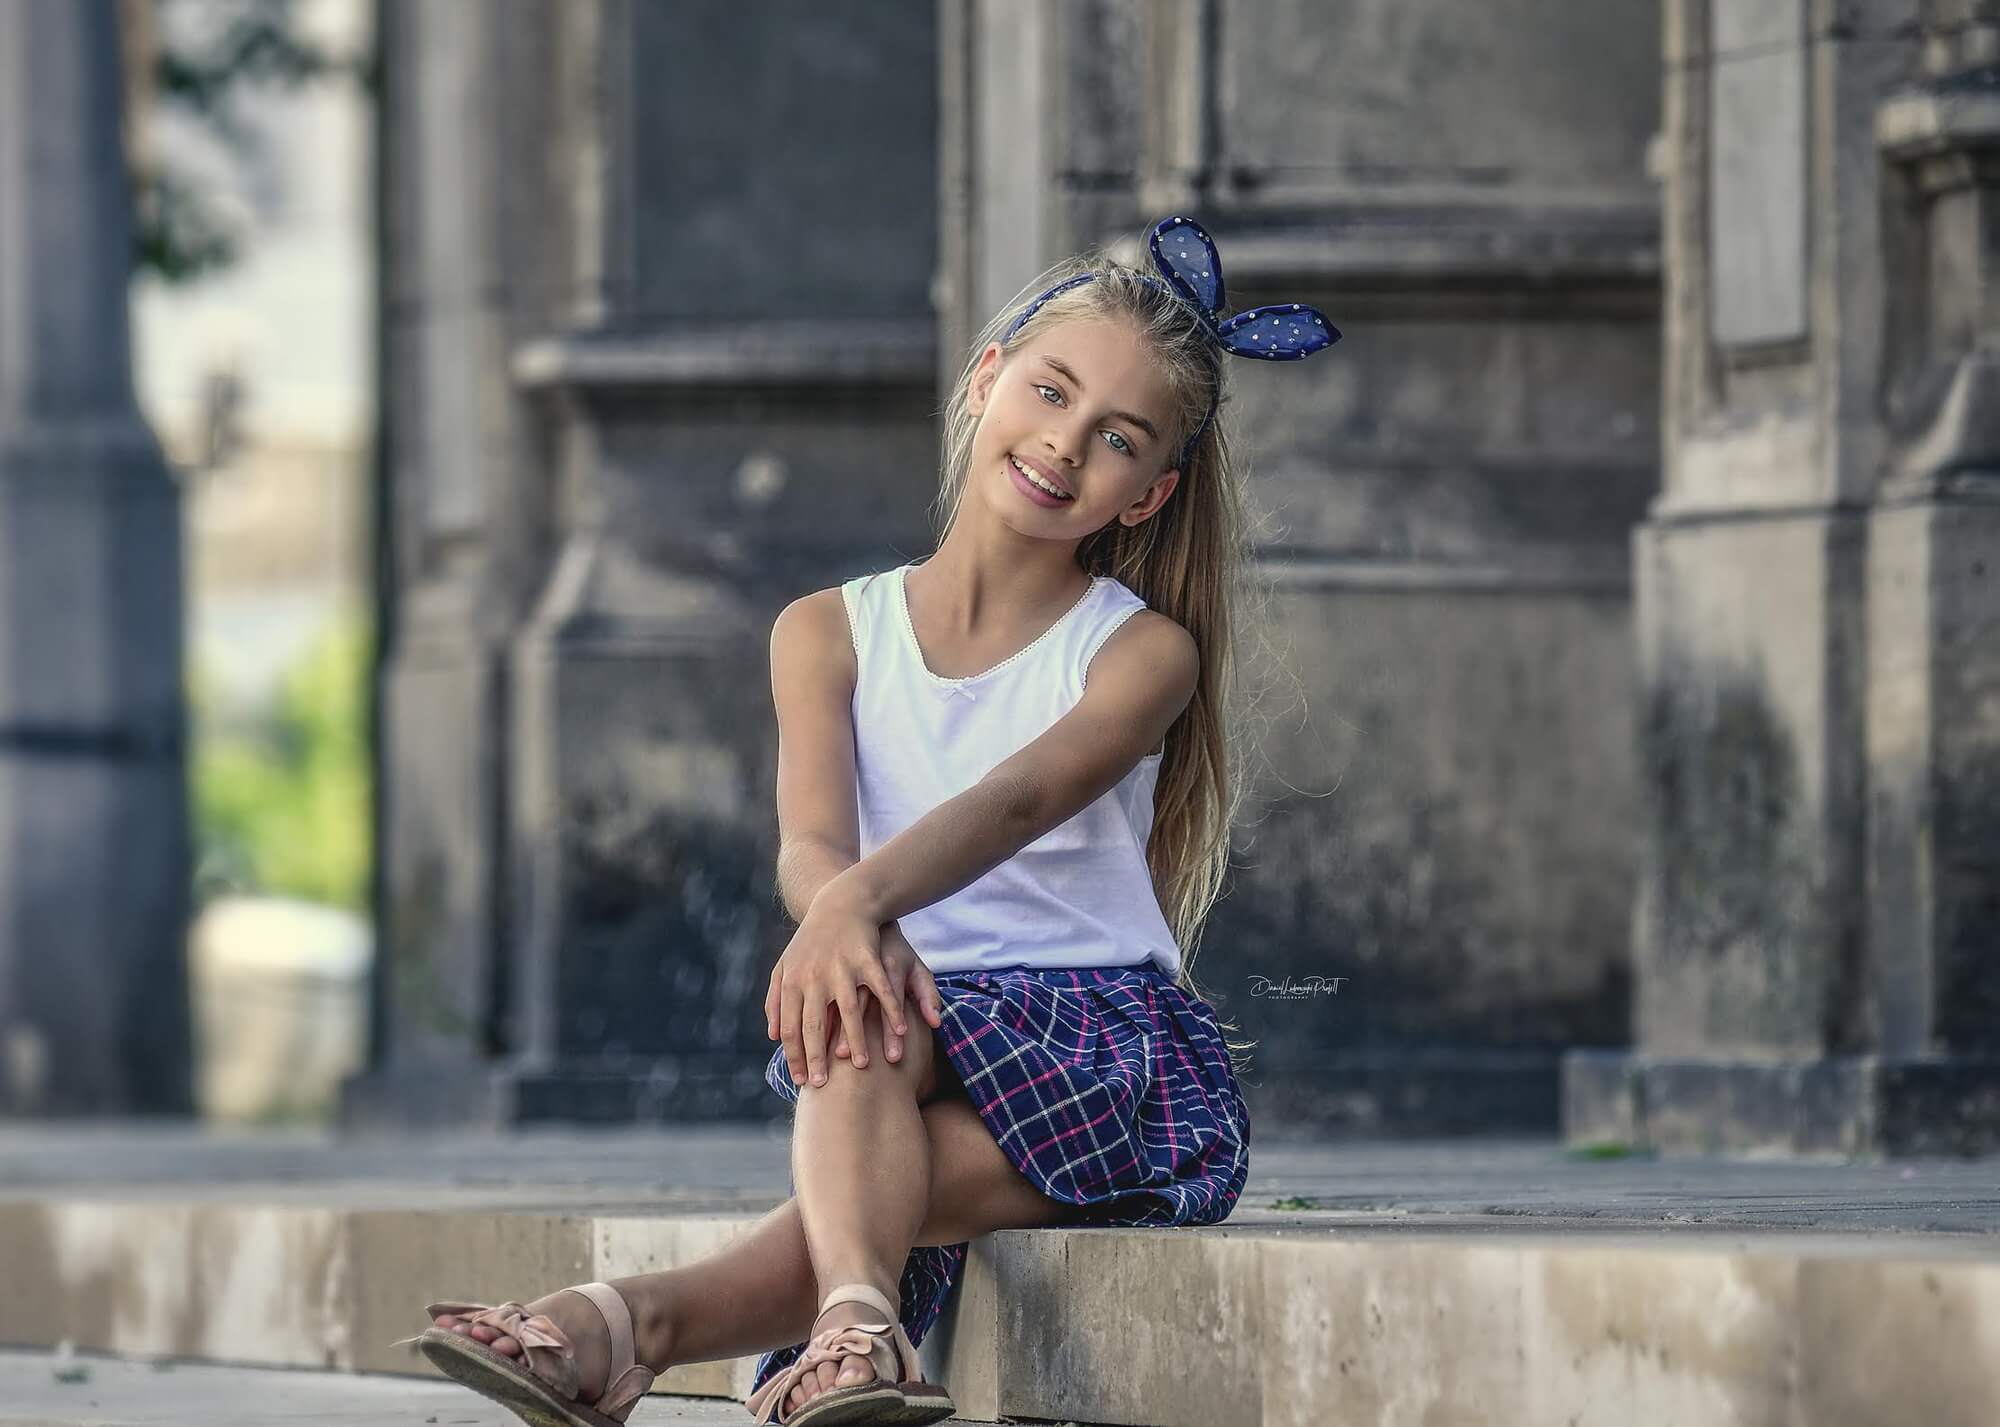 Kinderbilder von Daniel Sebastian Lubowicki